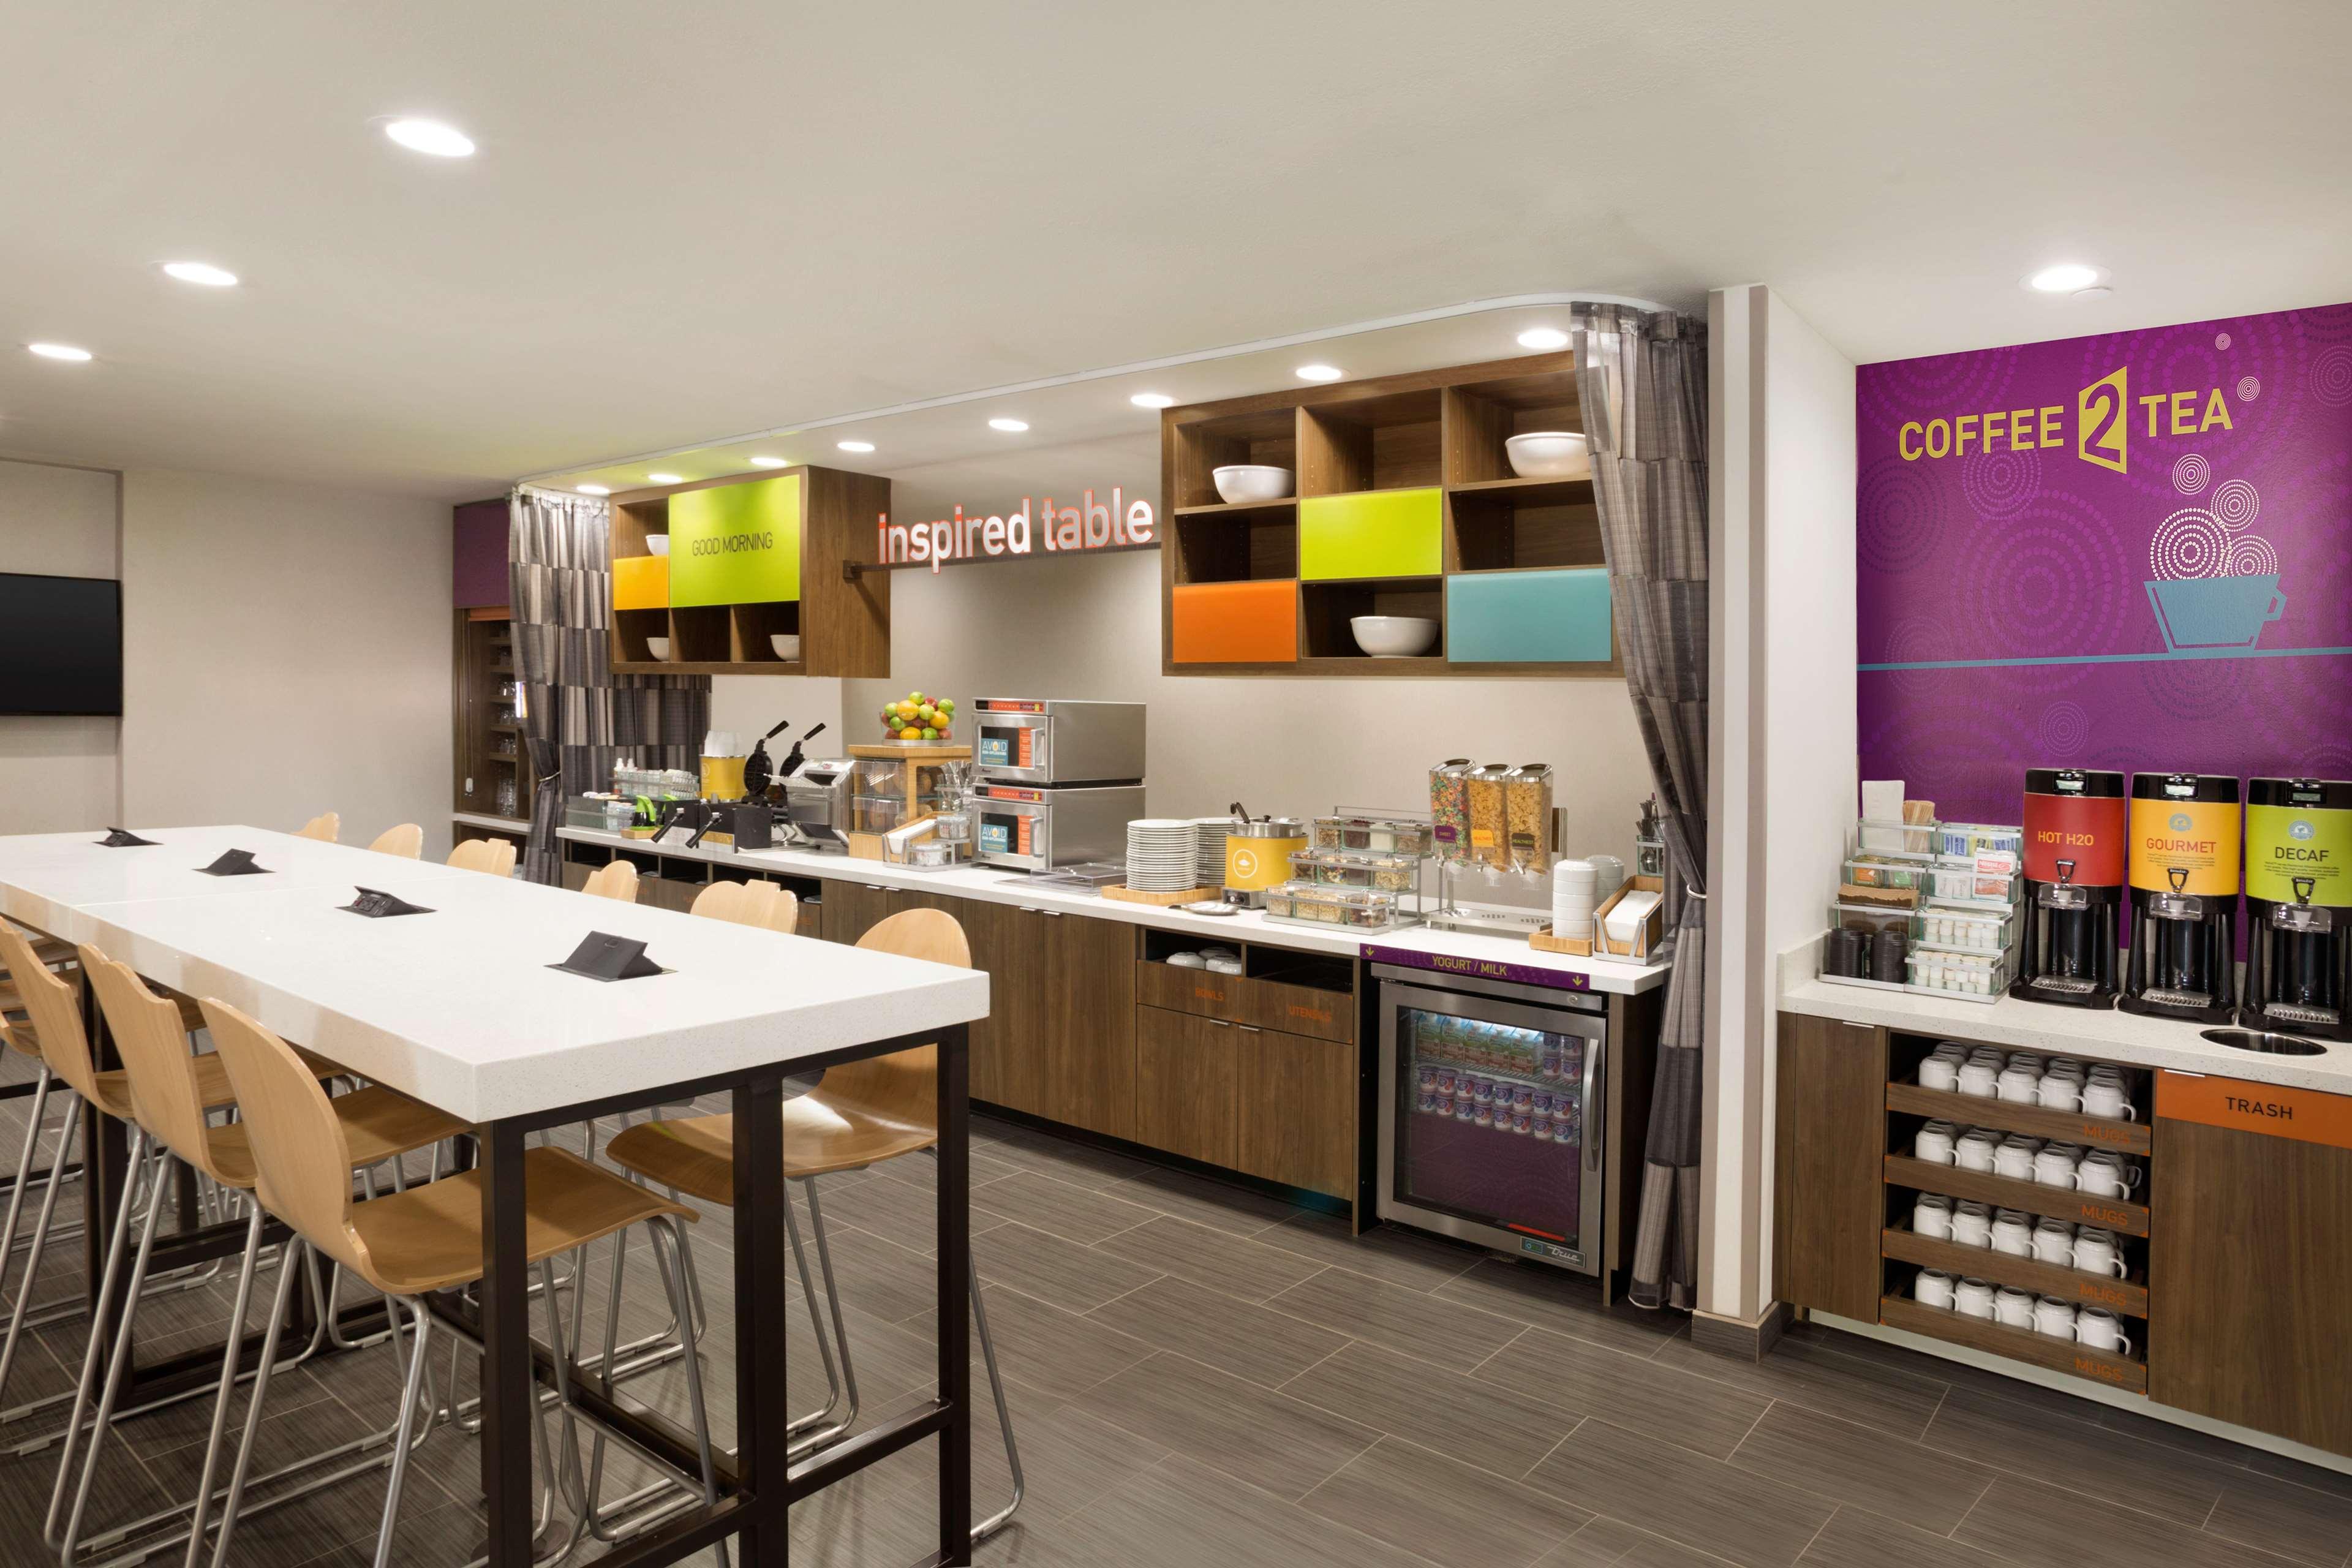 Home2 Suites by Hilton Houston/Webster image 9